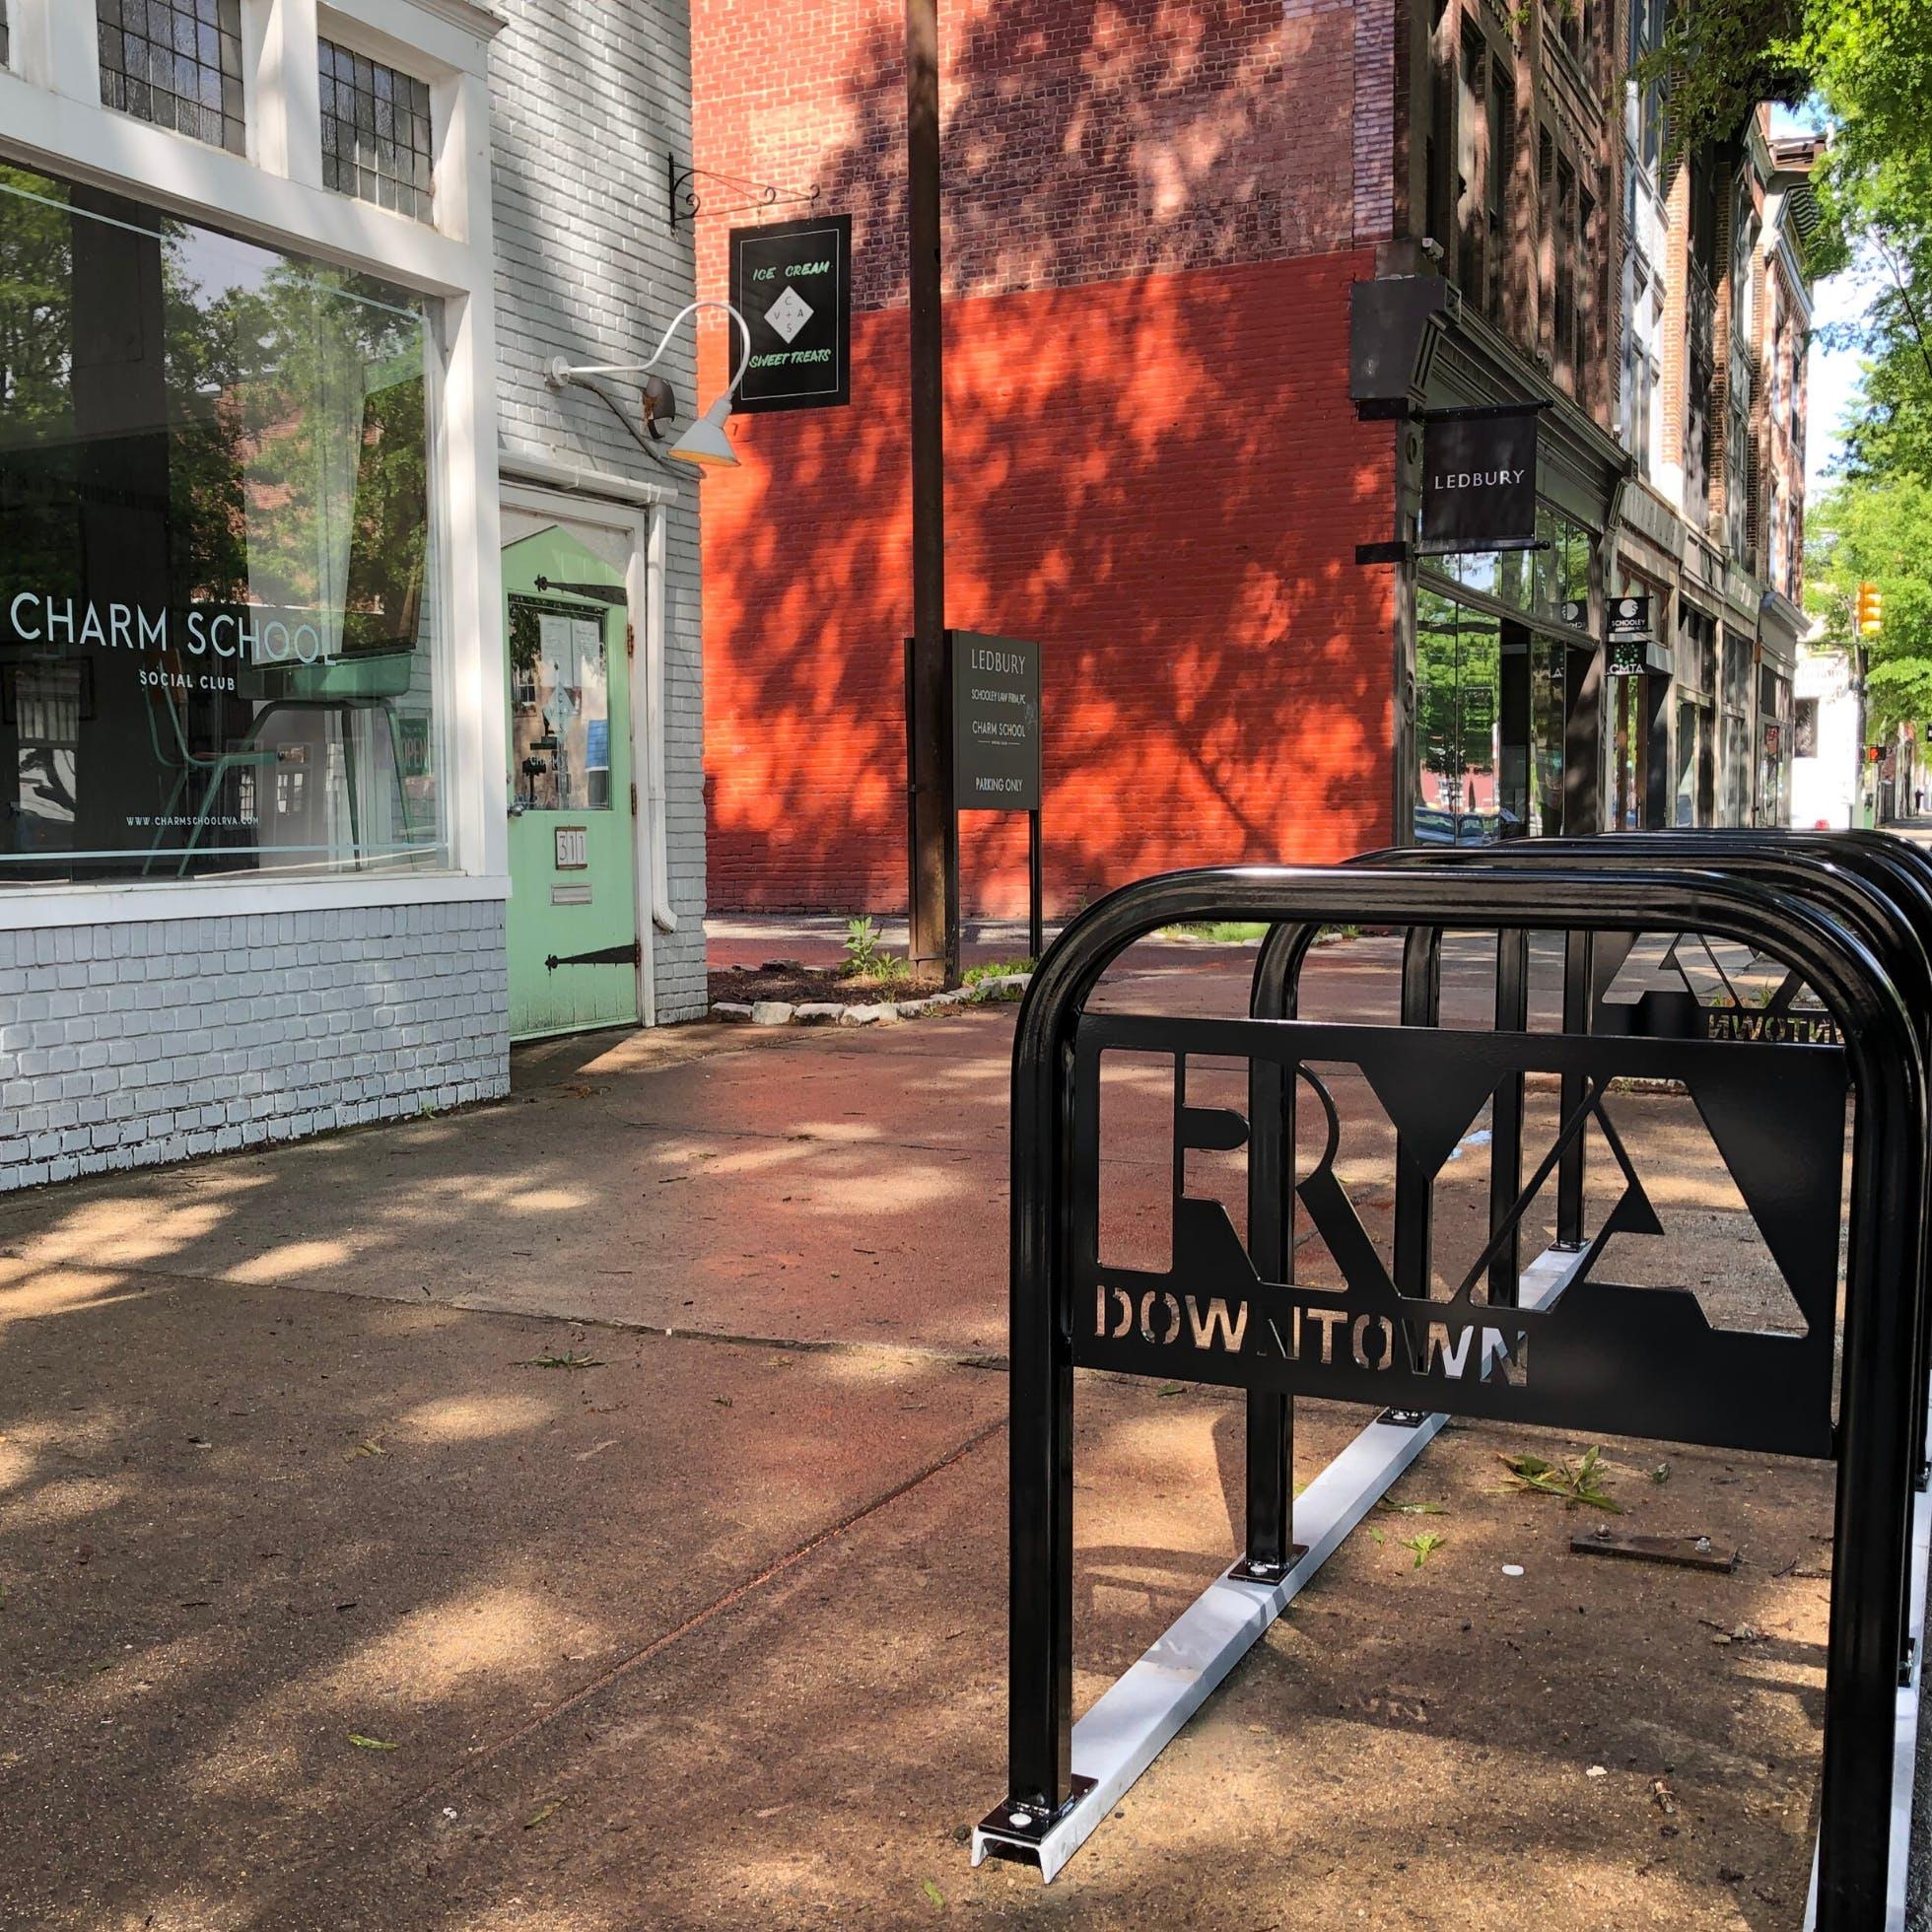 Downtown Richmond Bike Racks at Charm School